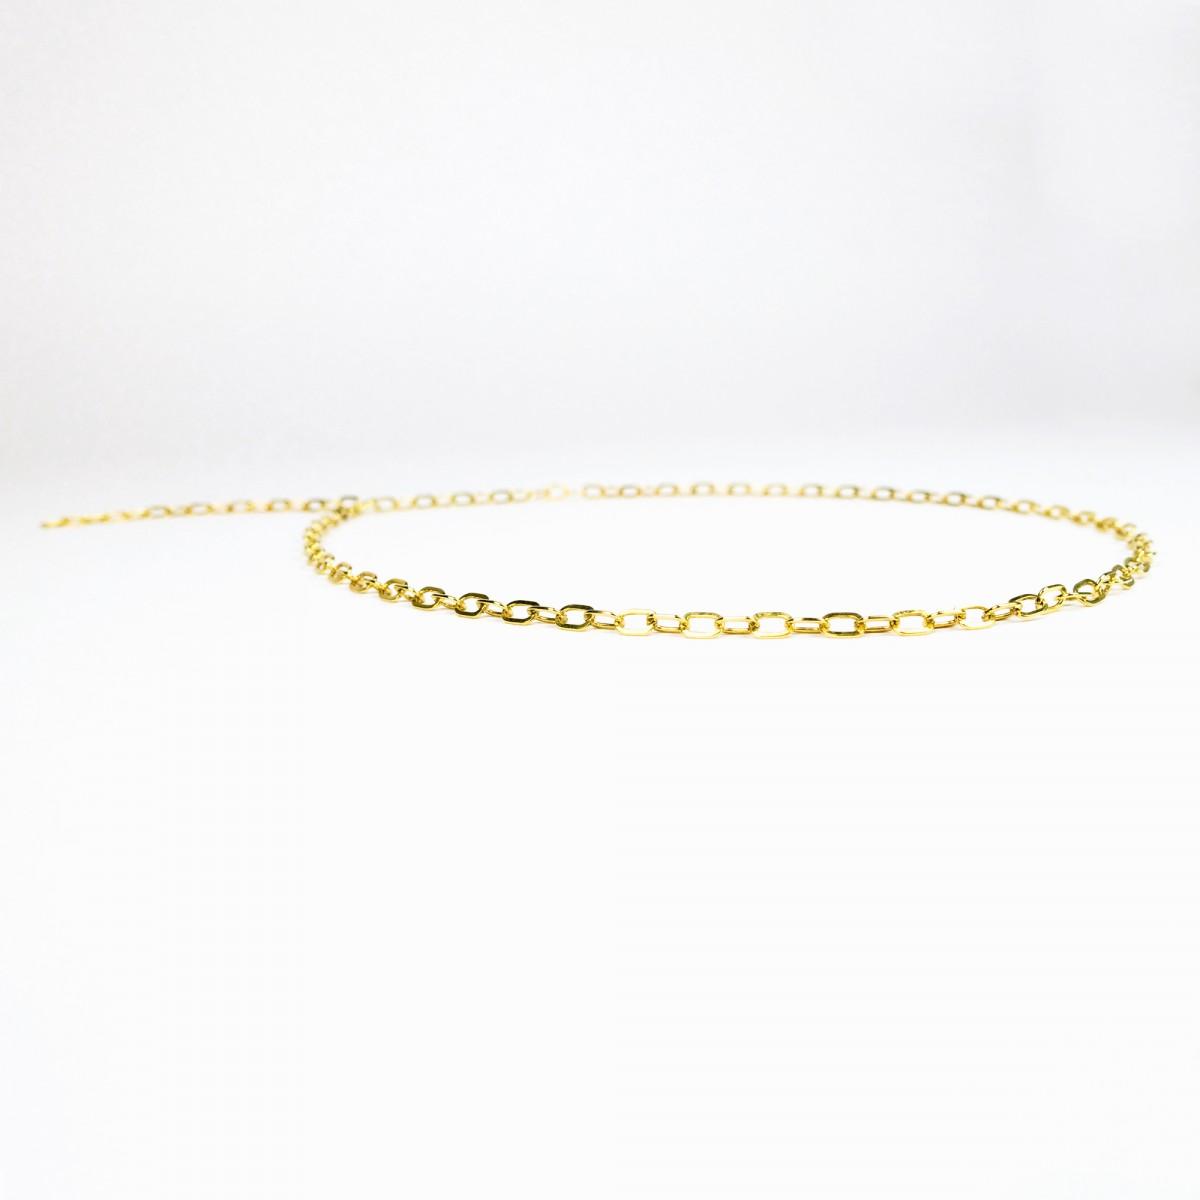 ST'ATOUR – AVA Kette in Gold, Silber oder Roségold